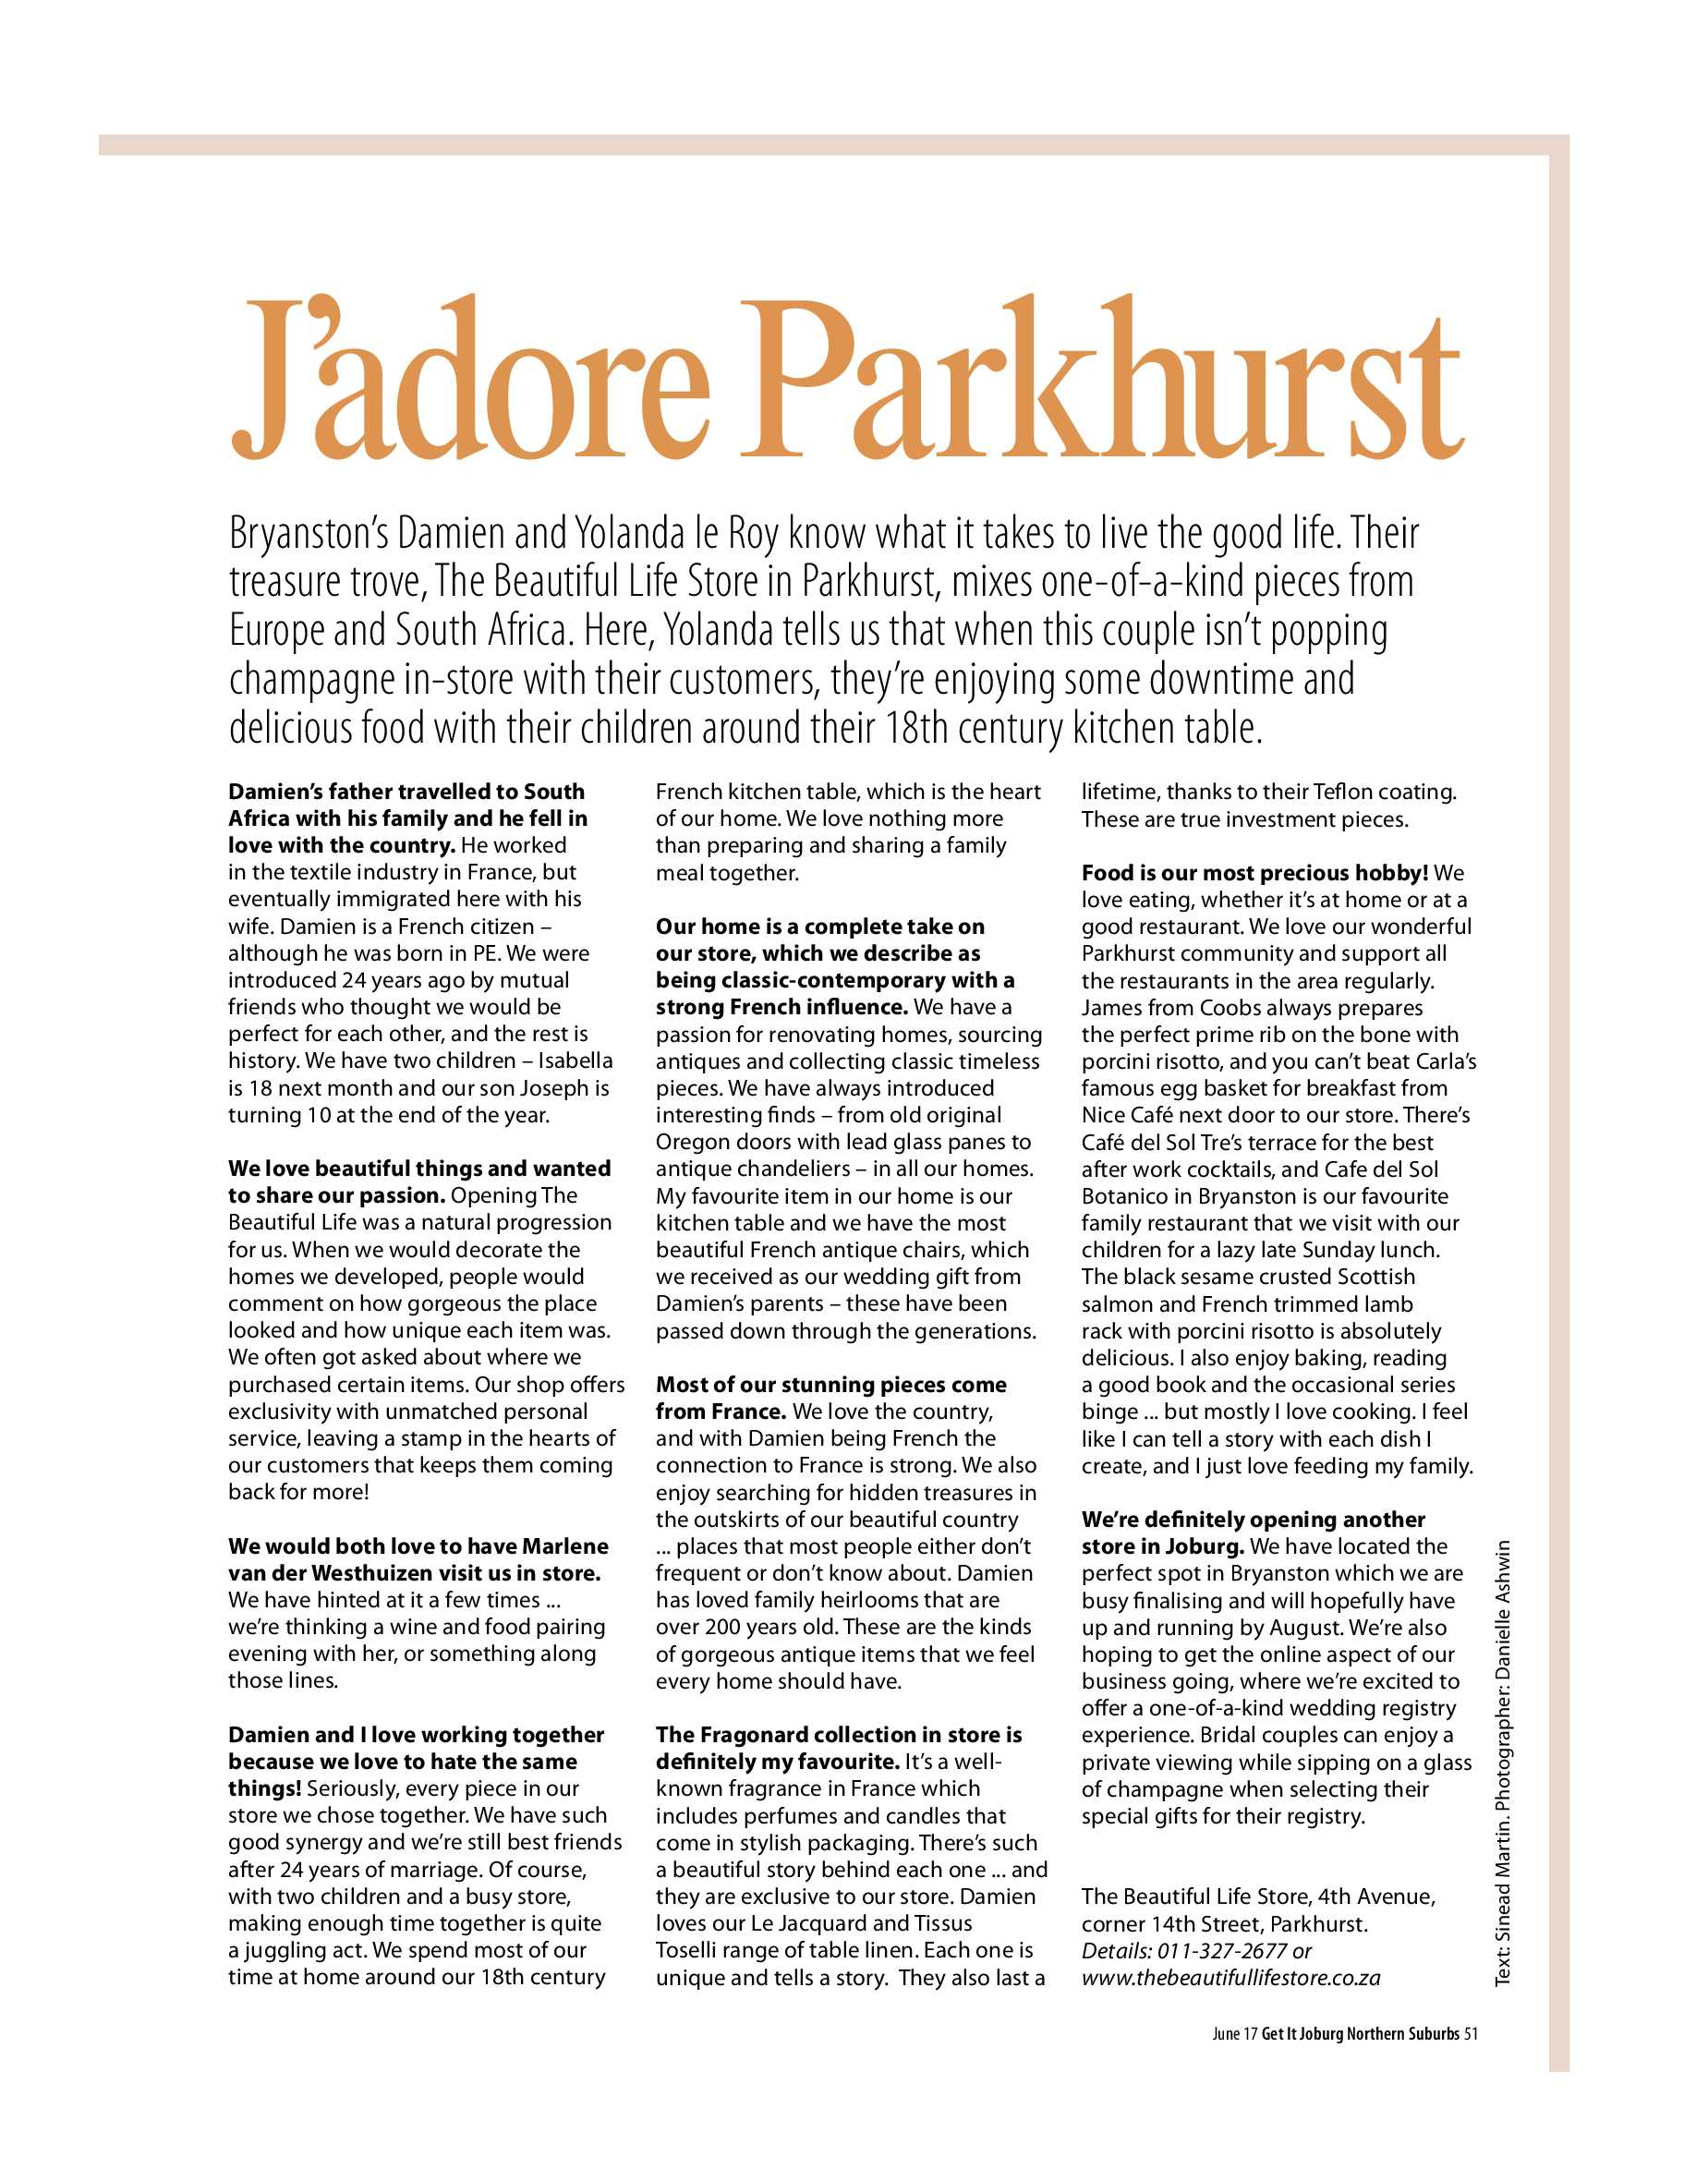 get-joburg-north-june-2017-epapers-page-51